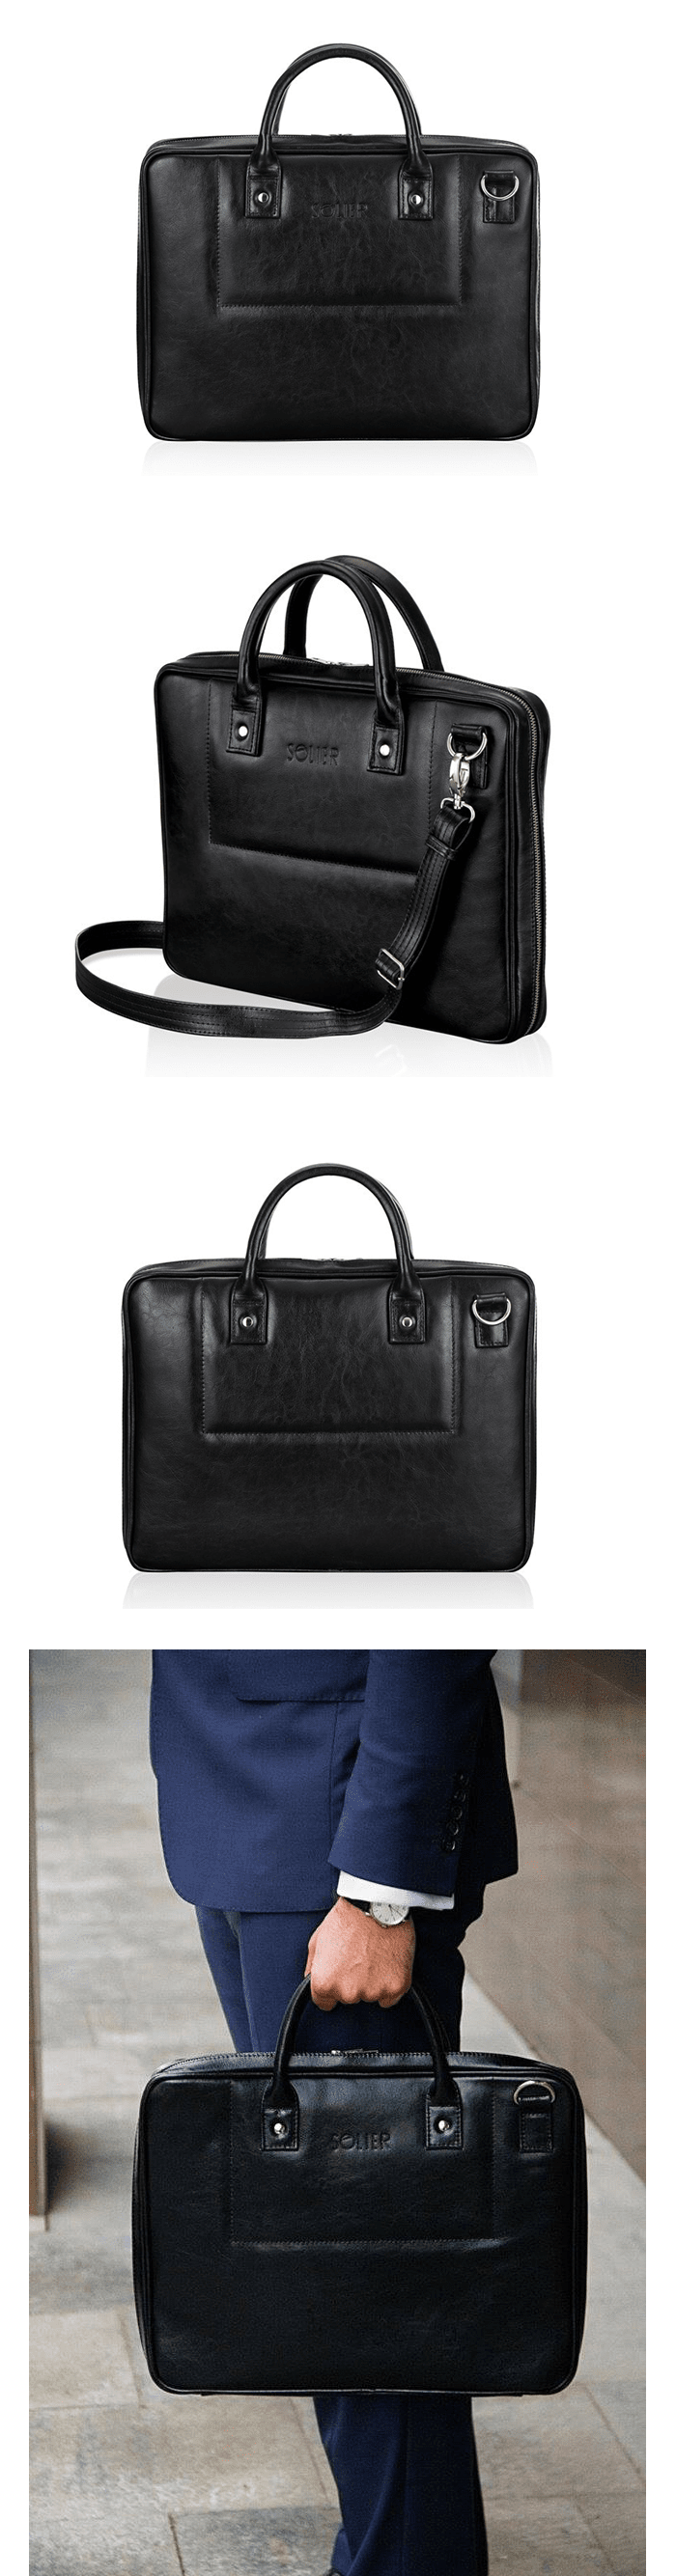 мужские сумки solier